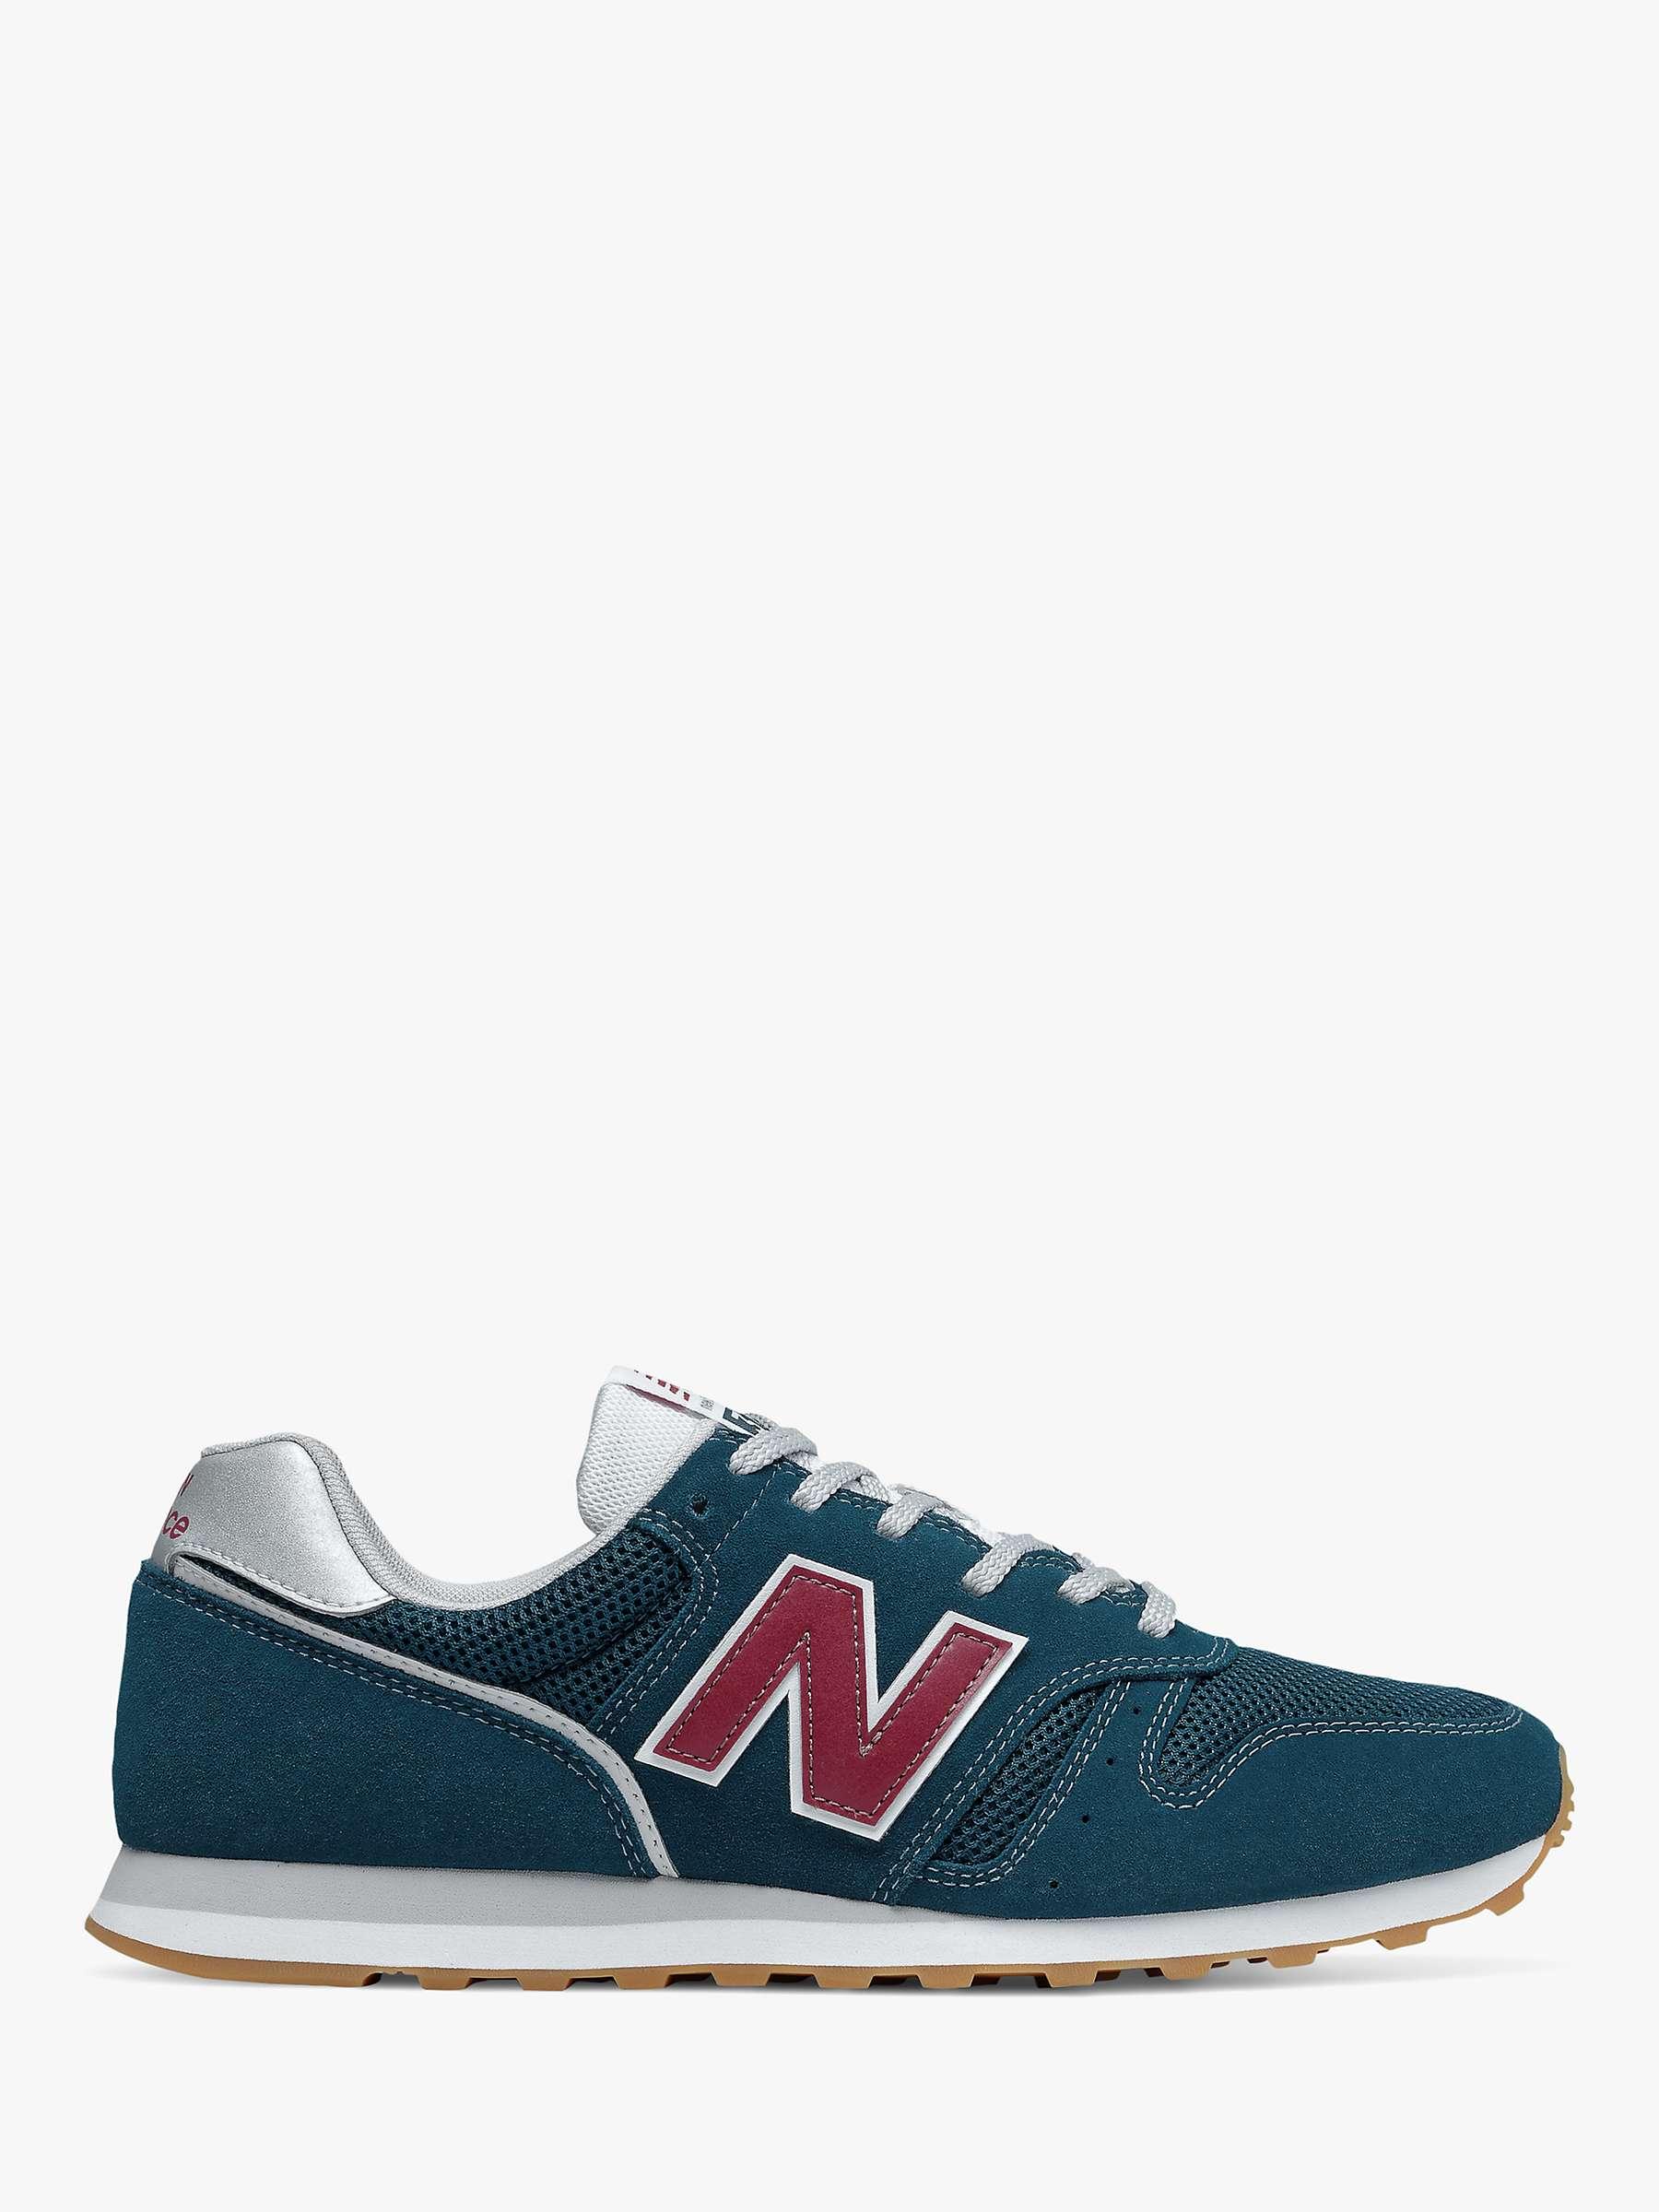 New Balance 373 V2 Trainers, Navy/Blue